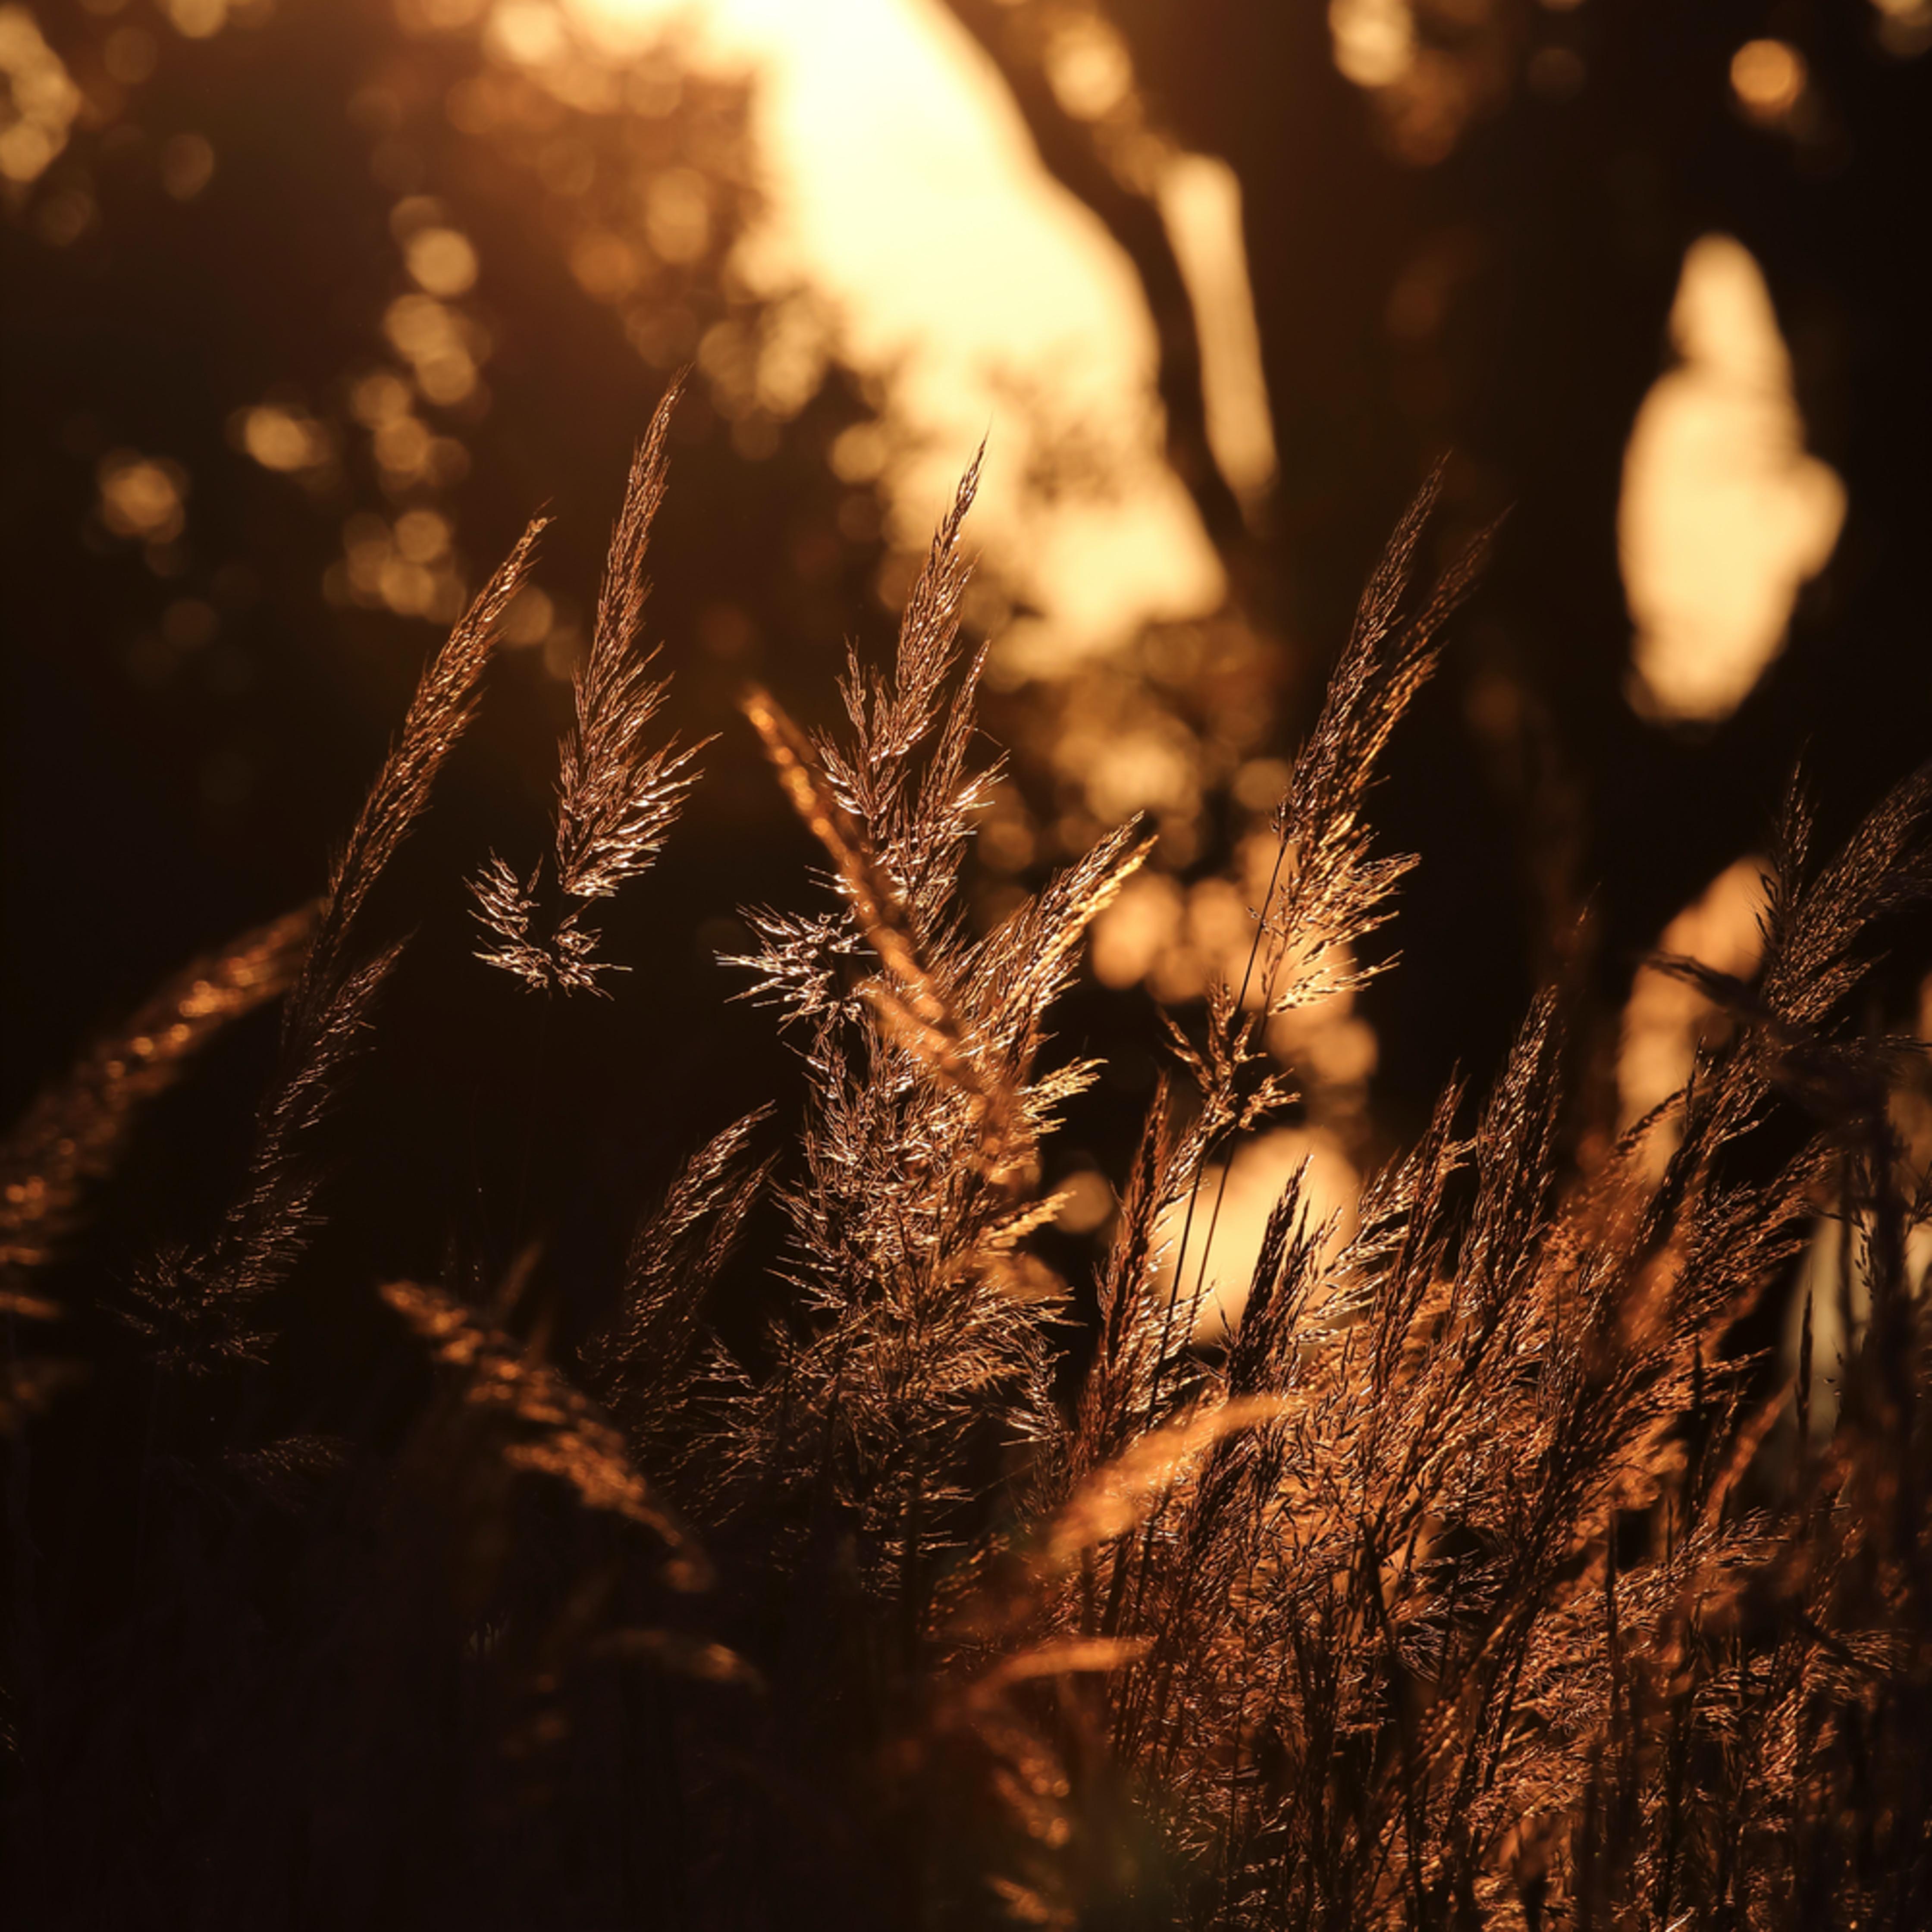 Prairie grass at sunrise xwbbew